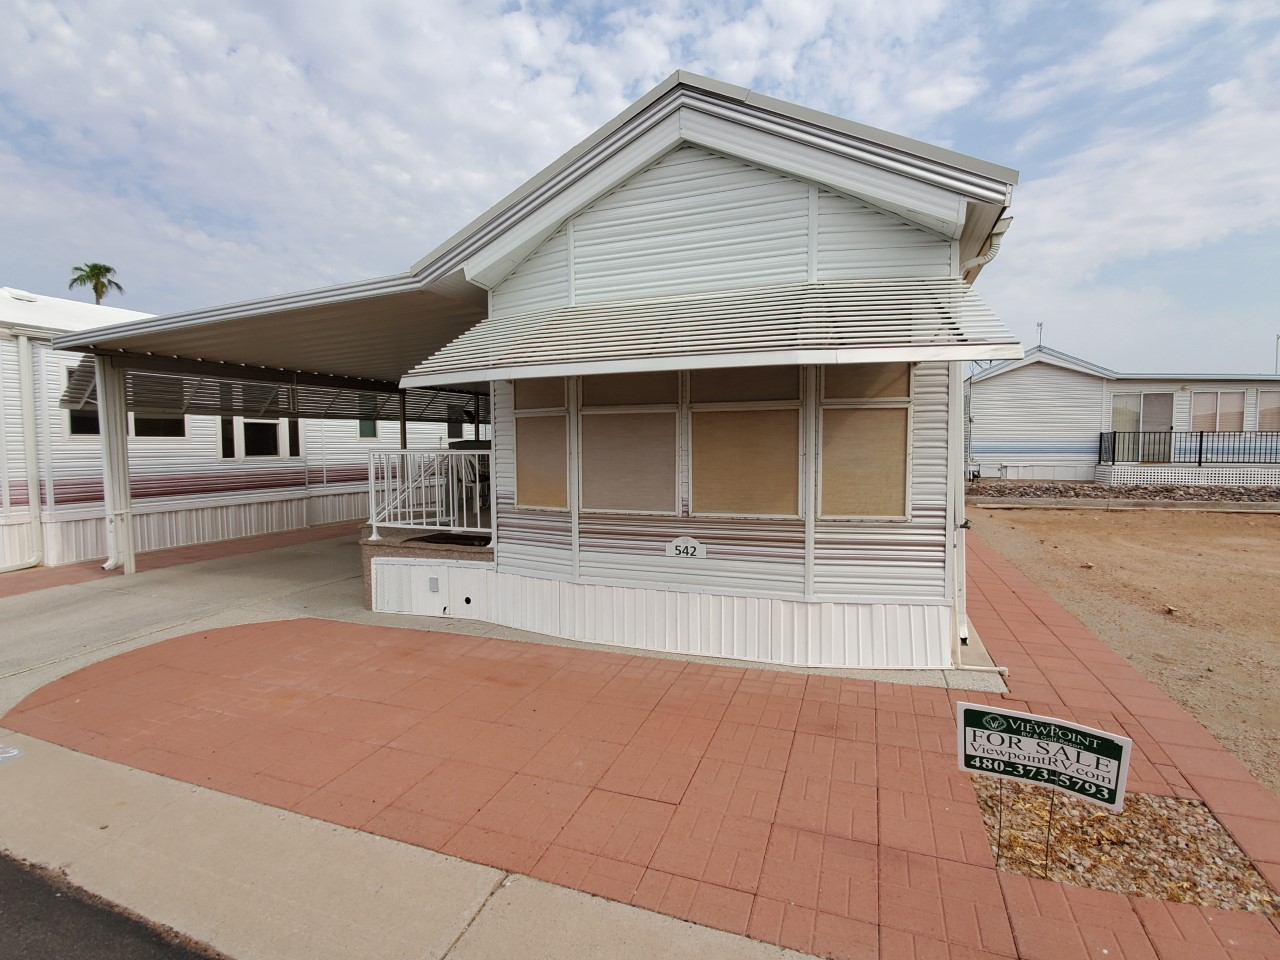 Park Model Home Lot #542